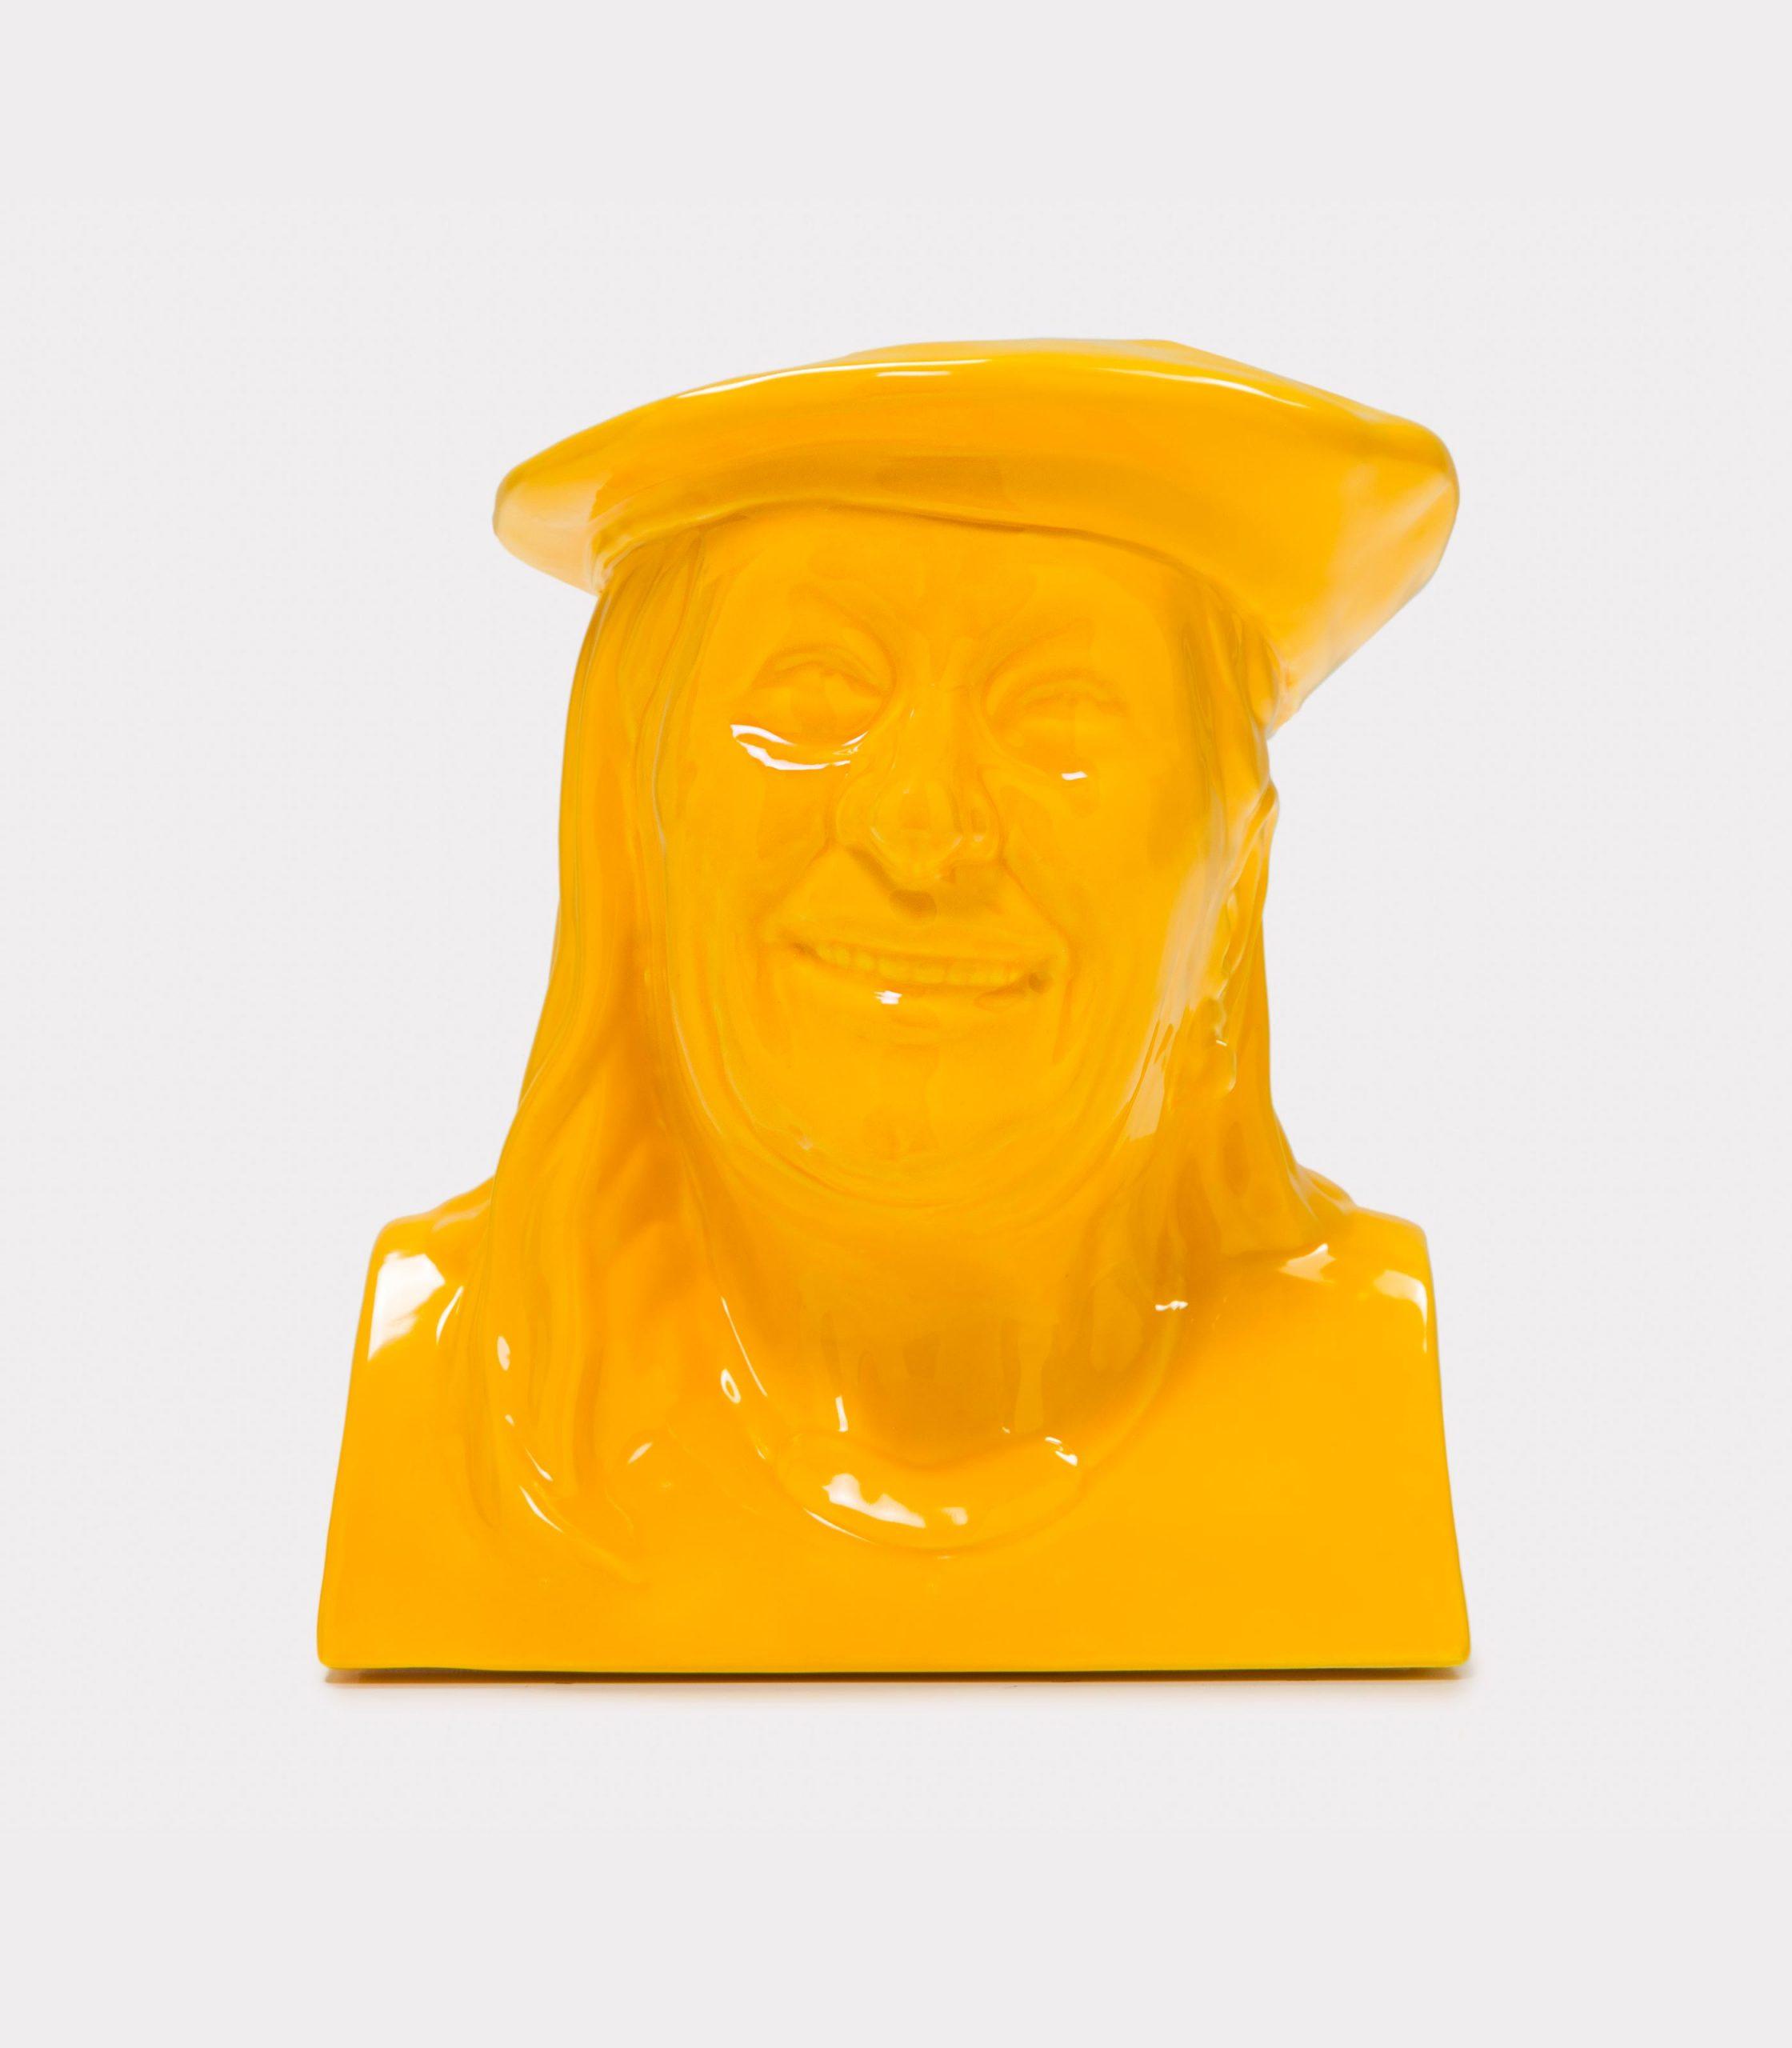 La Vilma giallo loopo milano design F